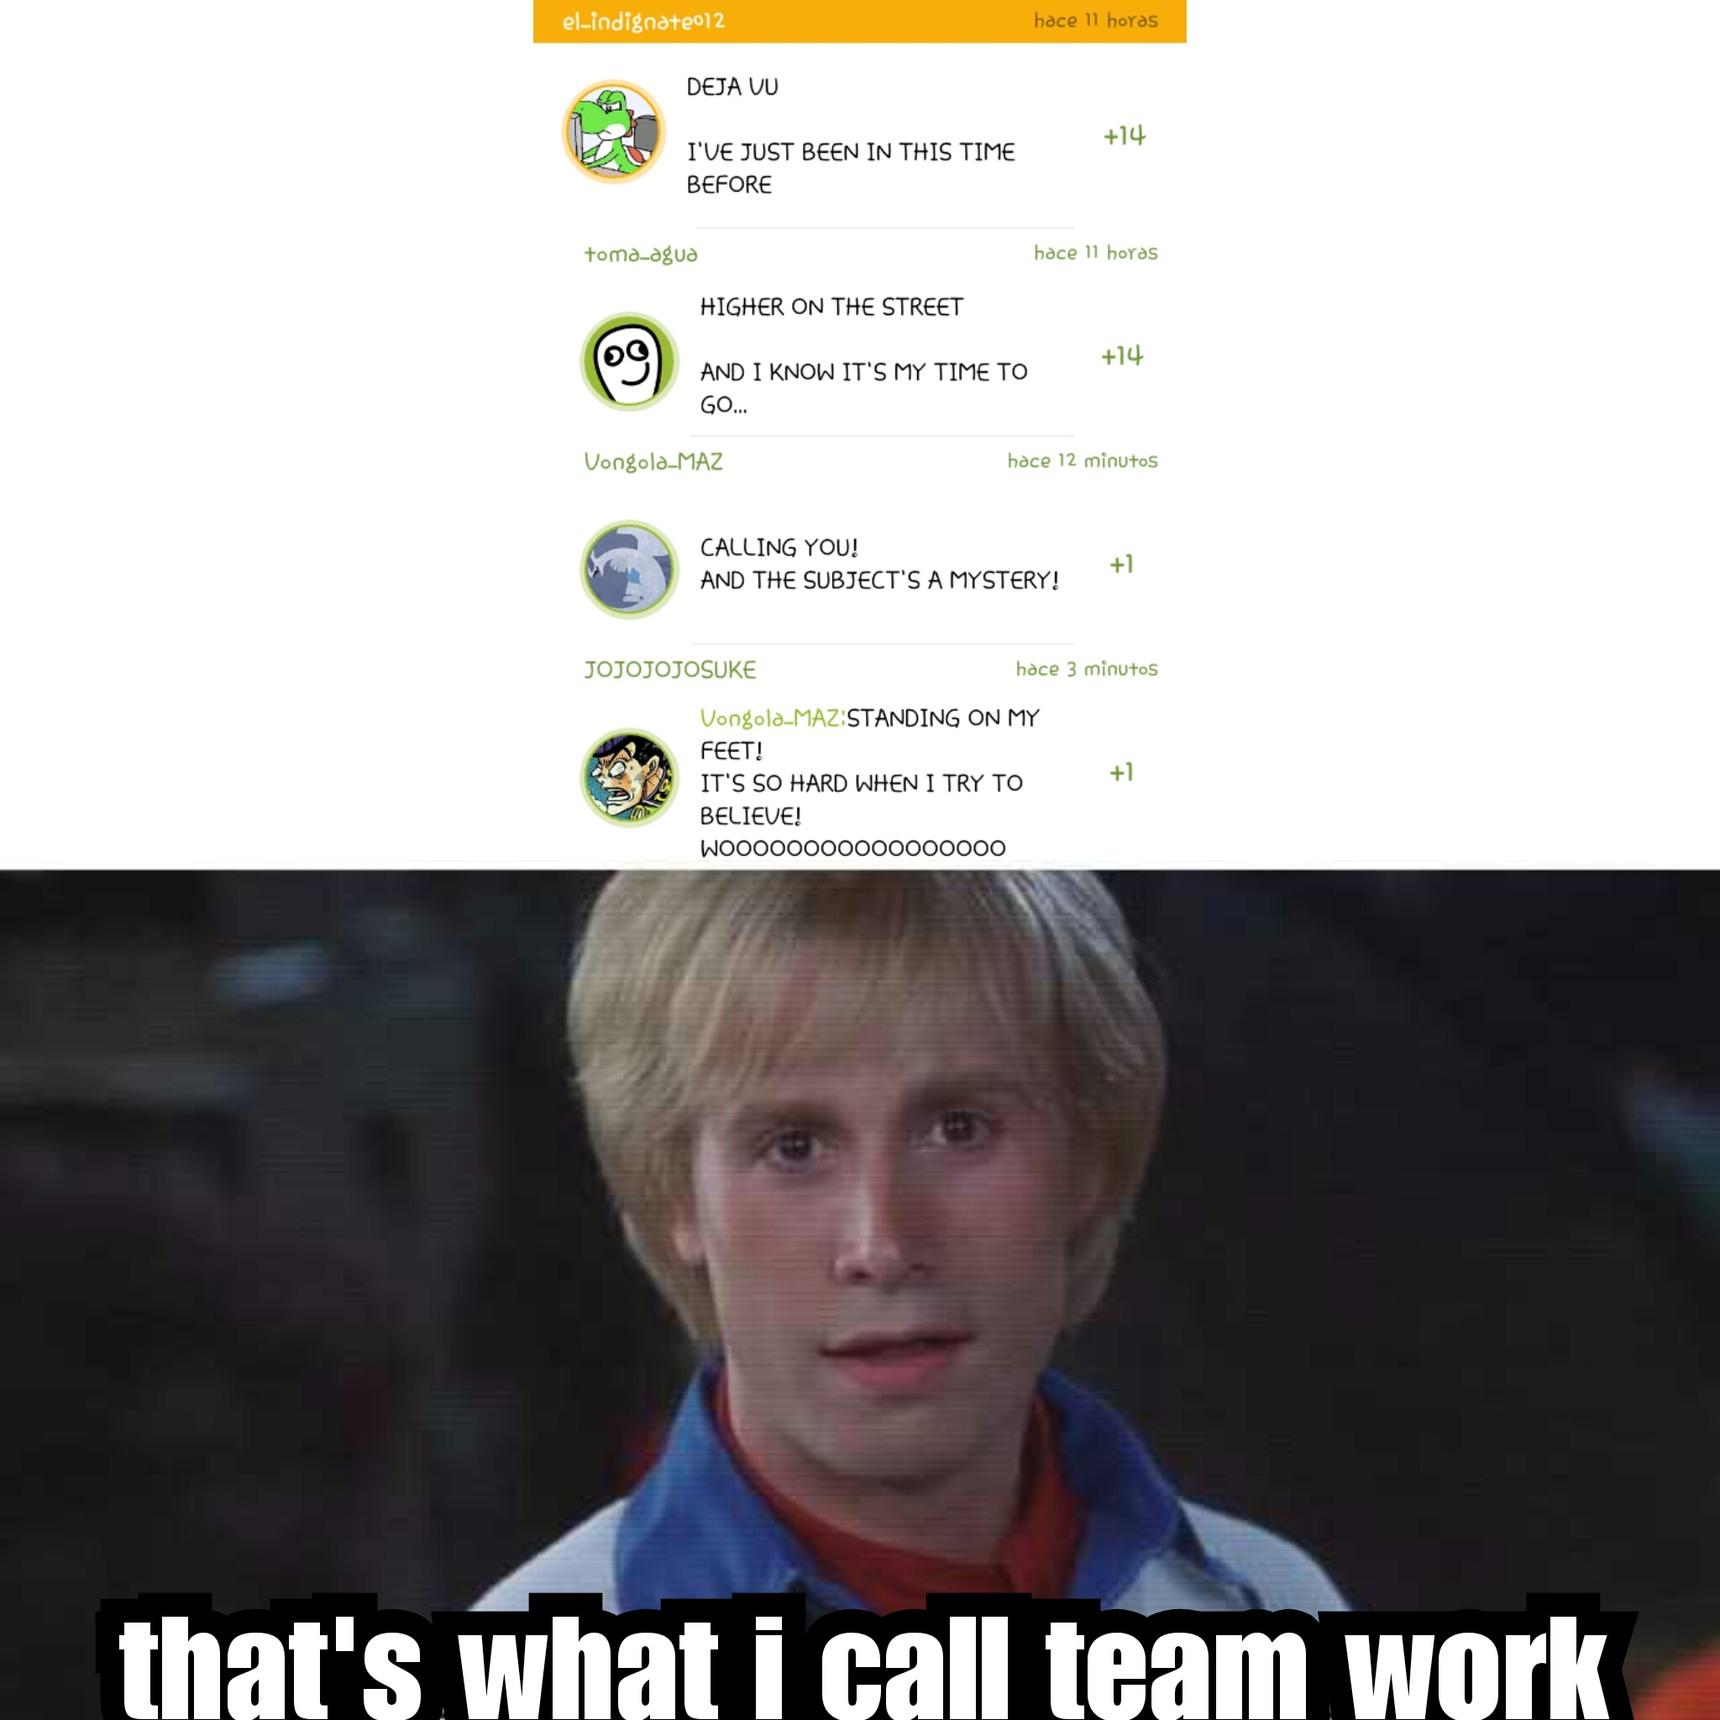 work - meme